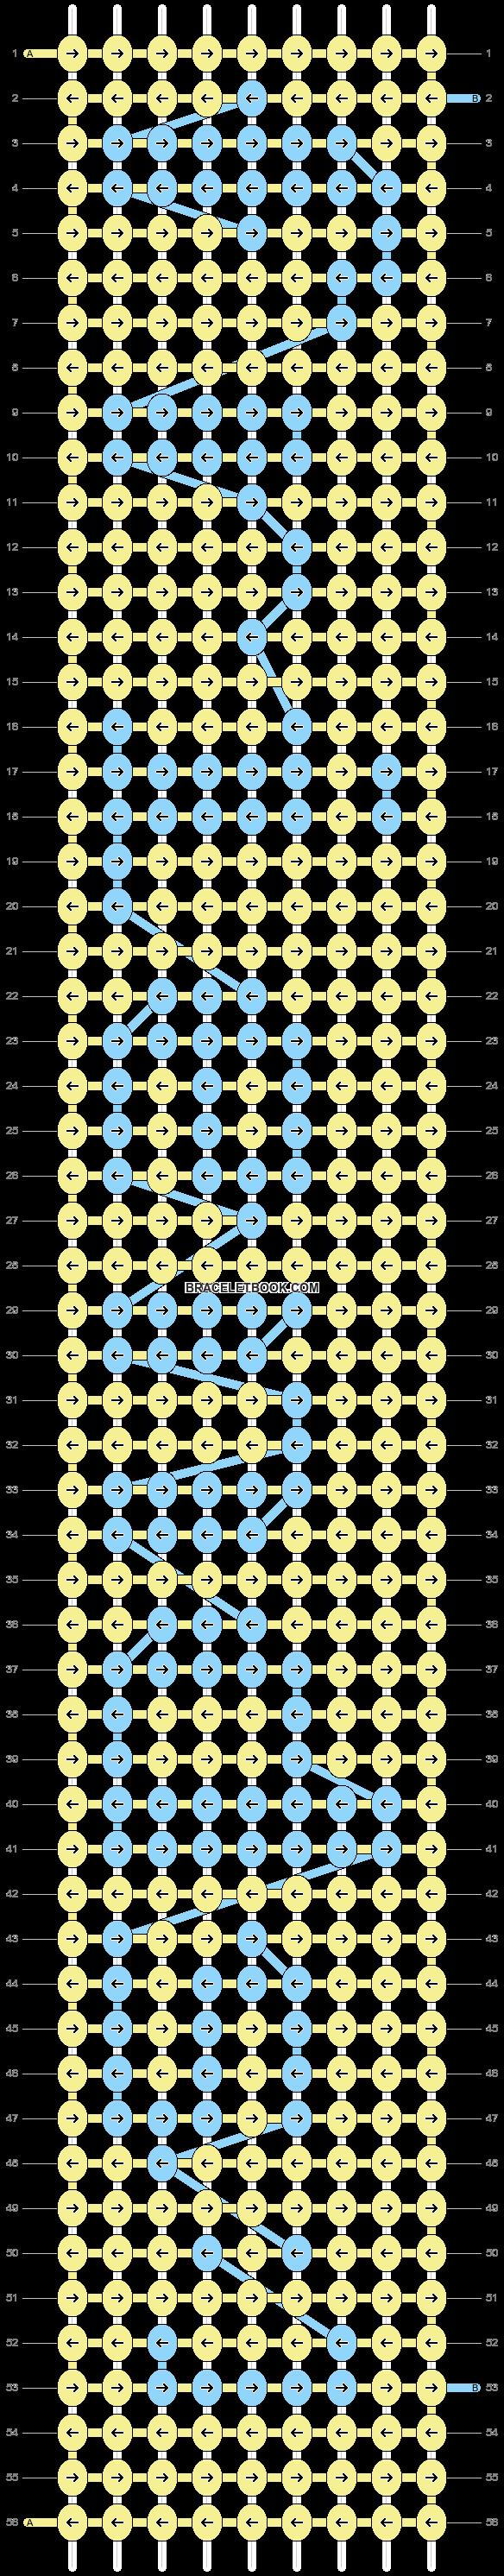 Alpha pattern #5864 variation #36198 pattern